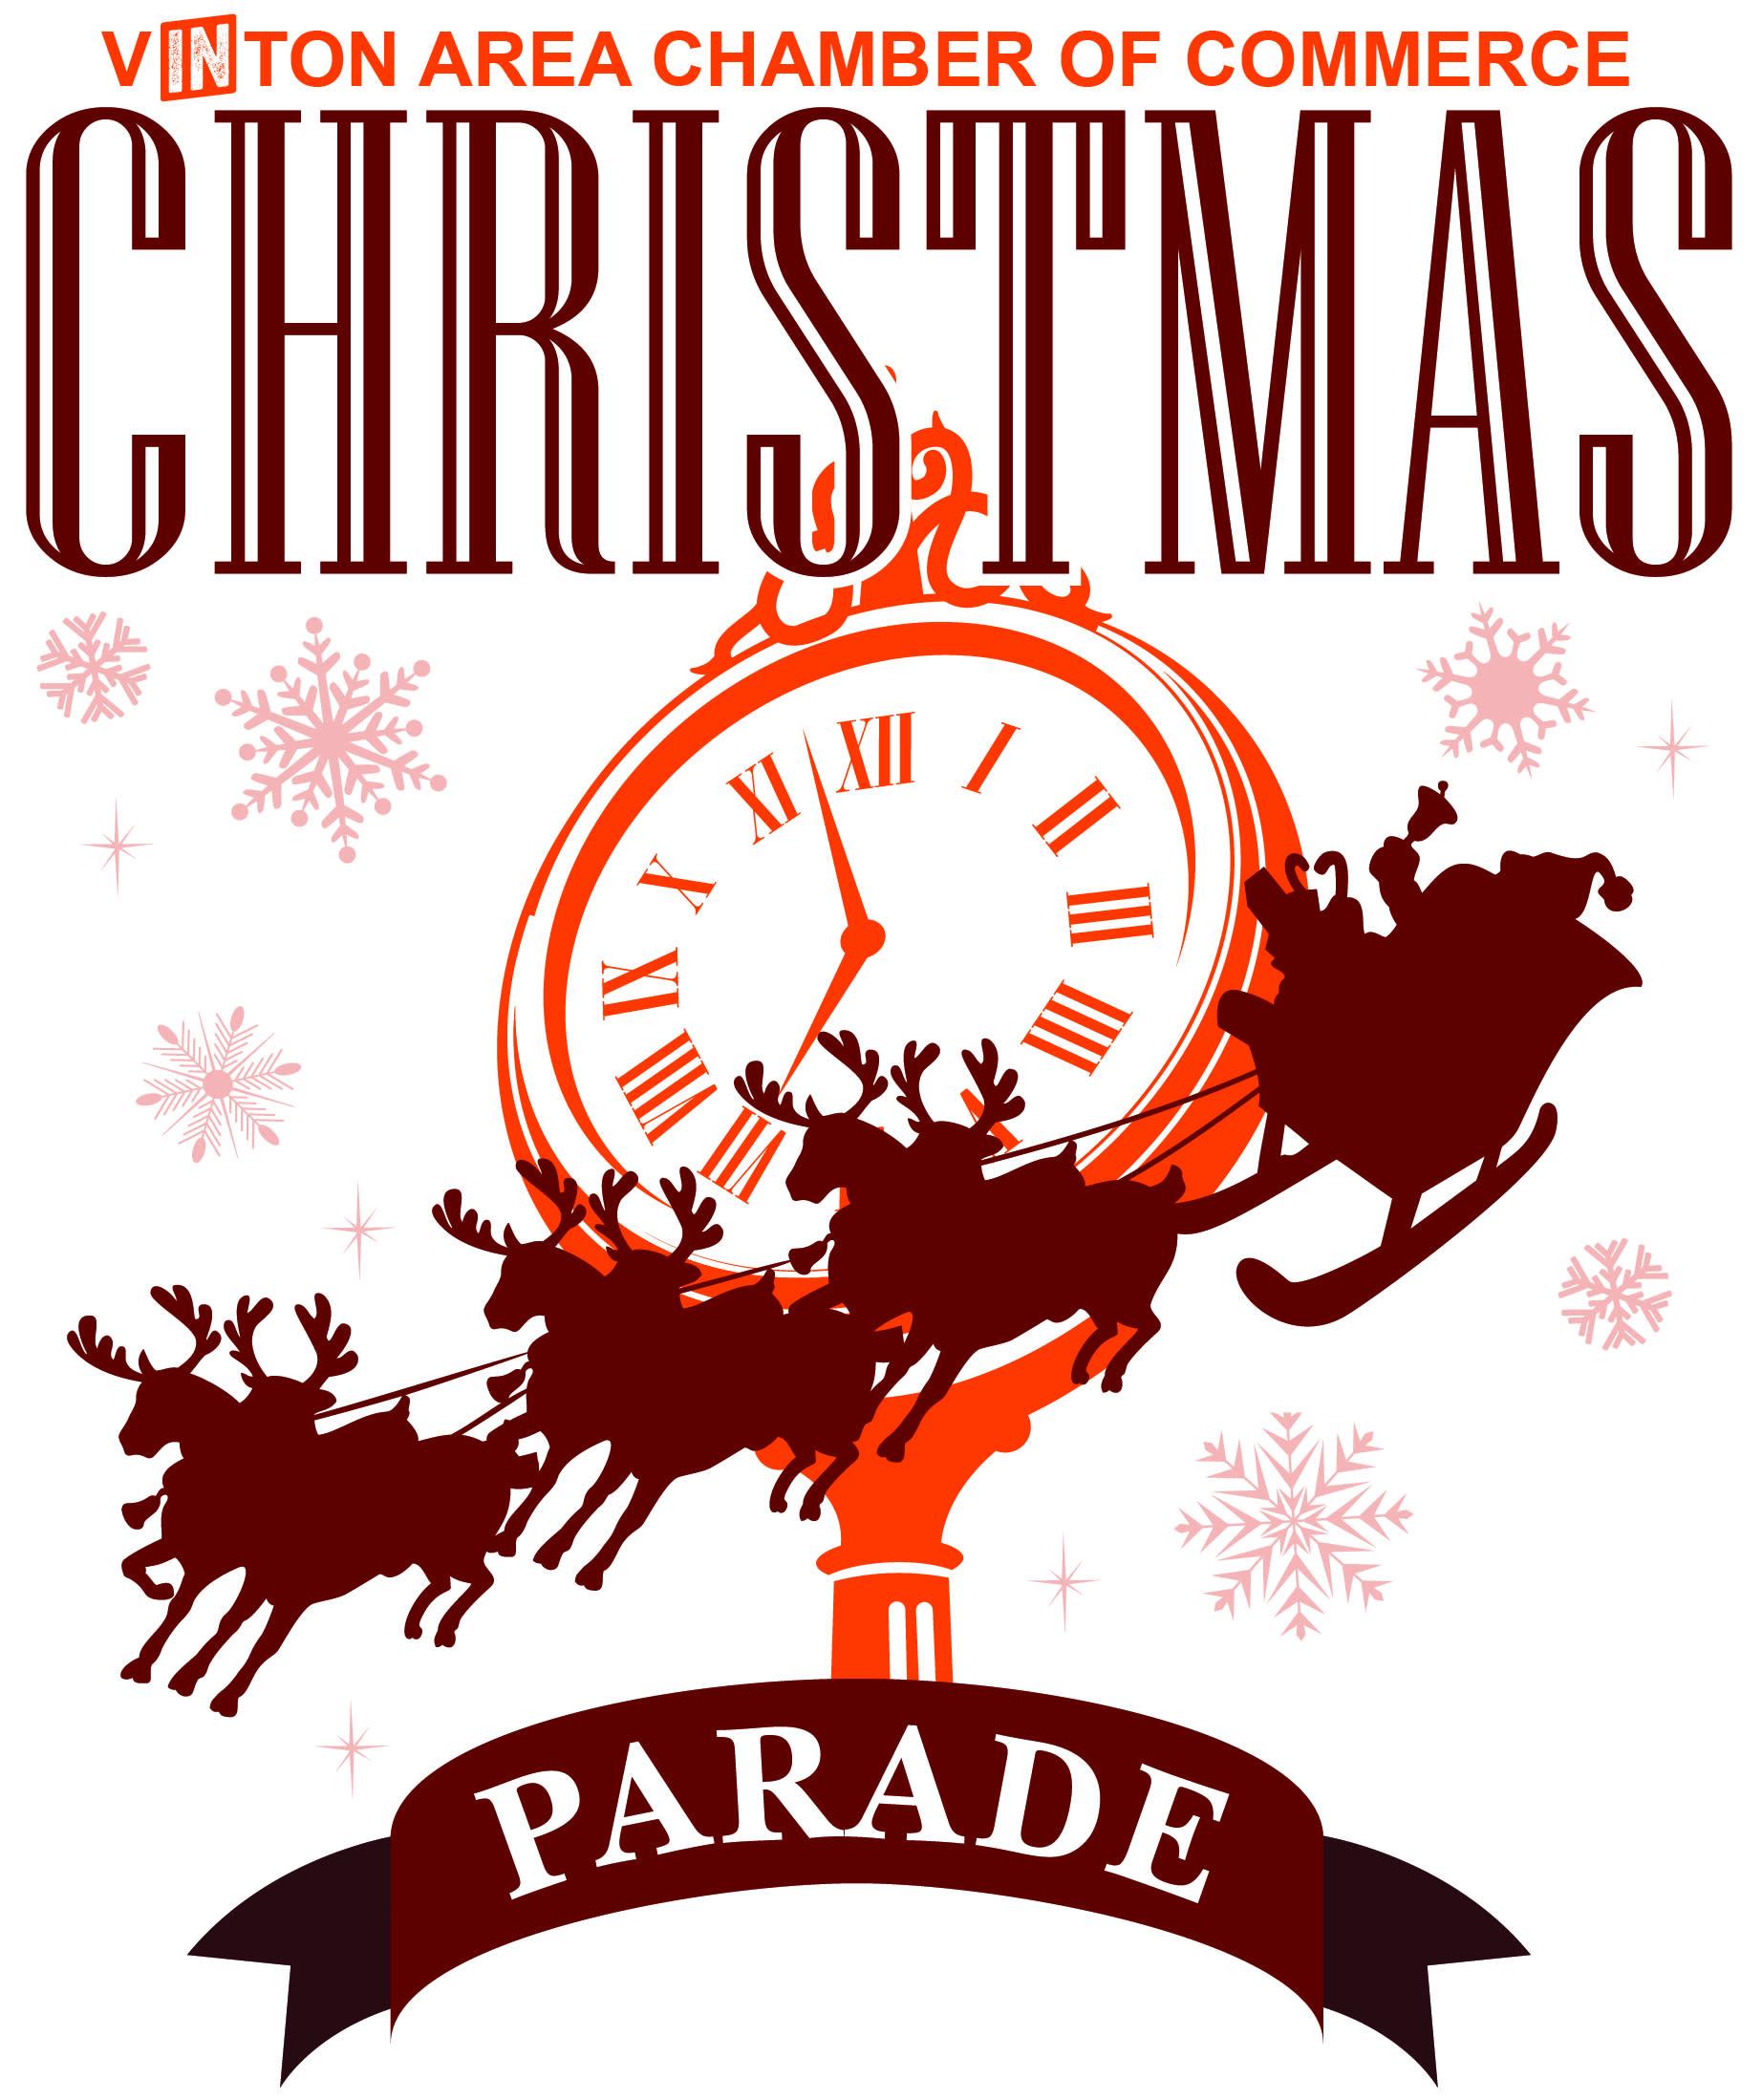 Roanoke City Christmas Parade 2020 2020 Vintage Vinton Drive Through Christmas Parade | Vinton, VA 24179